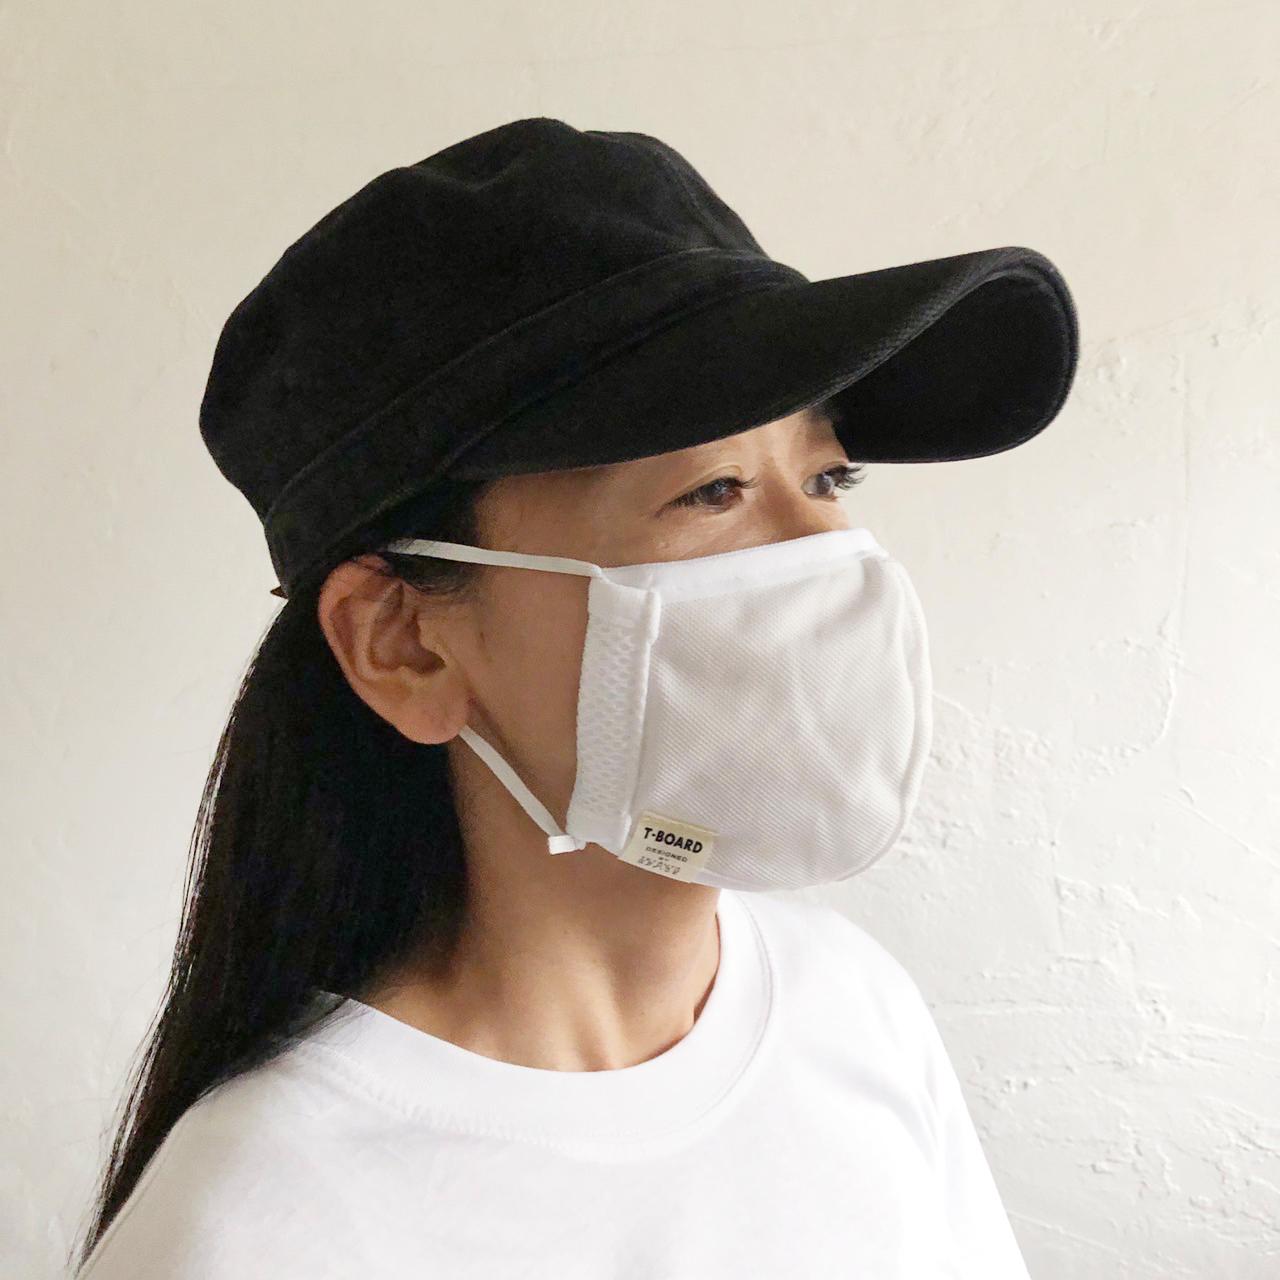 T-BOARD ORIGINAL 洗濯できるマスク。画像その2